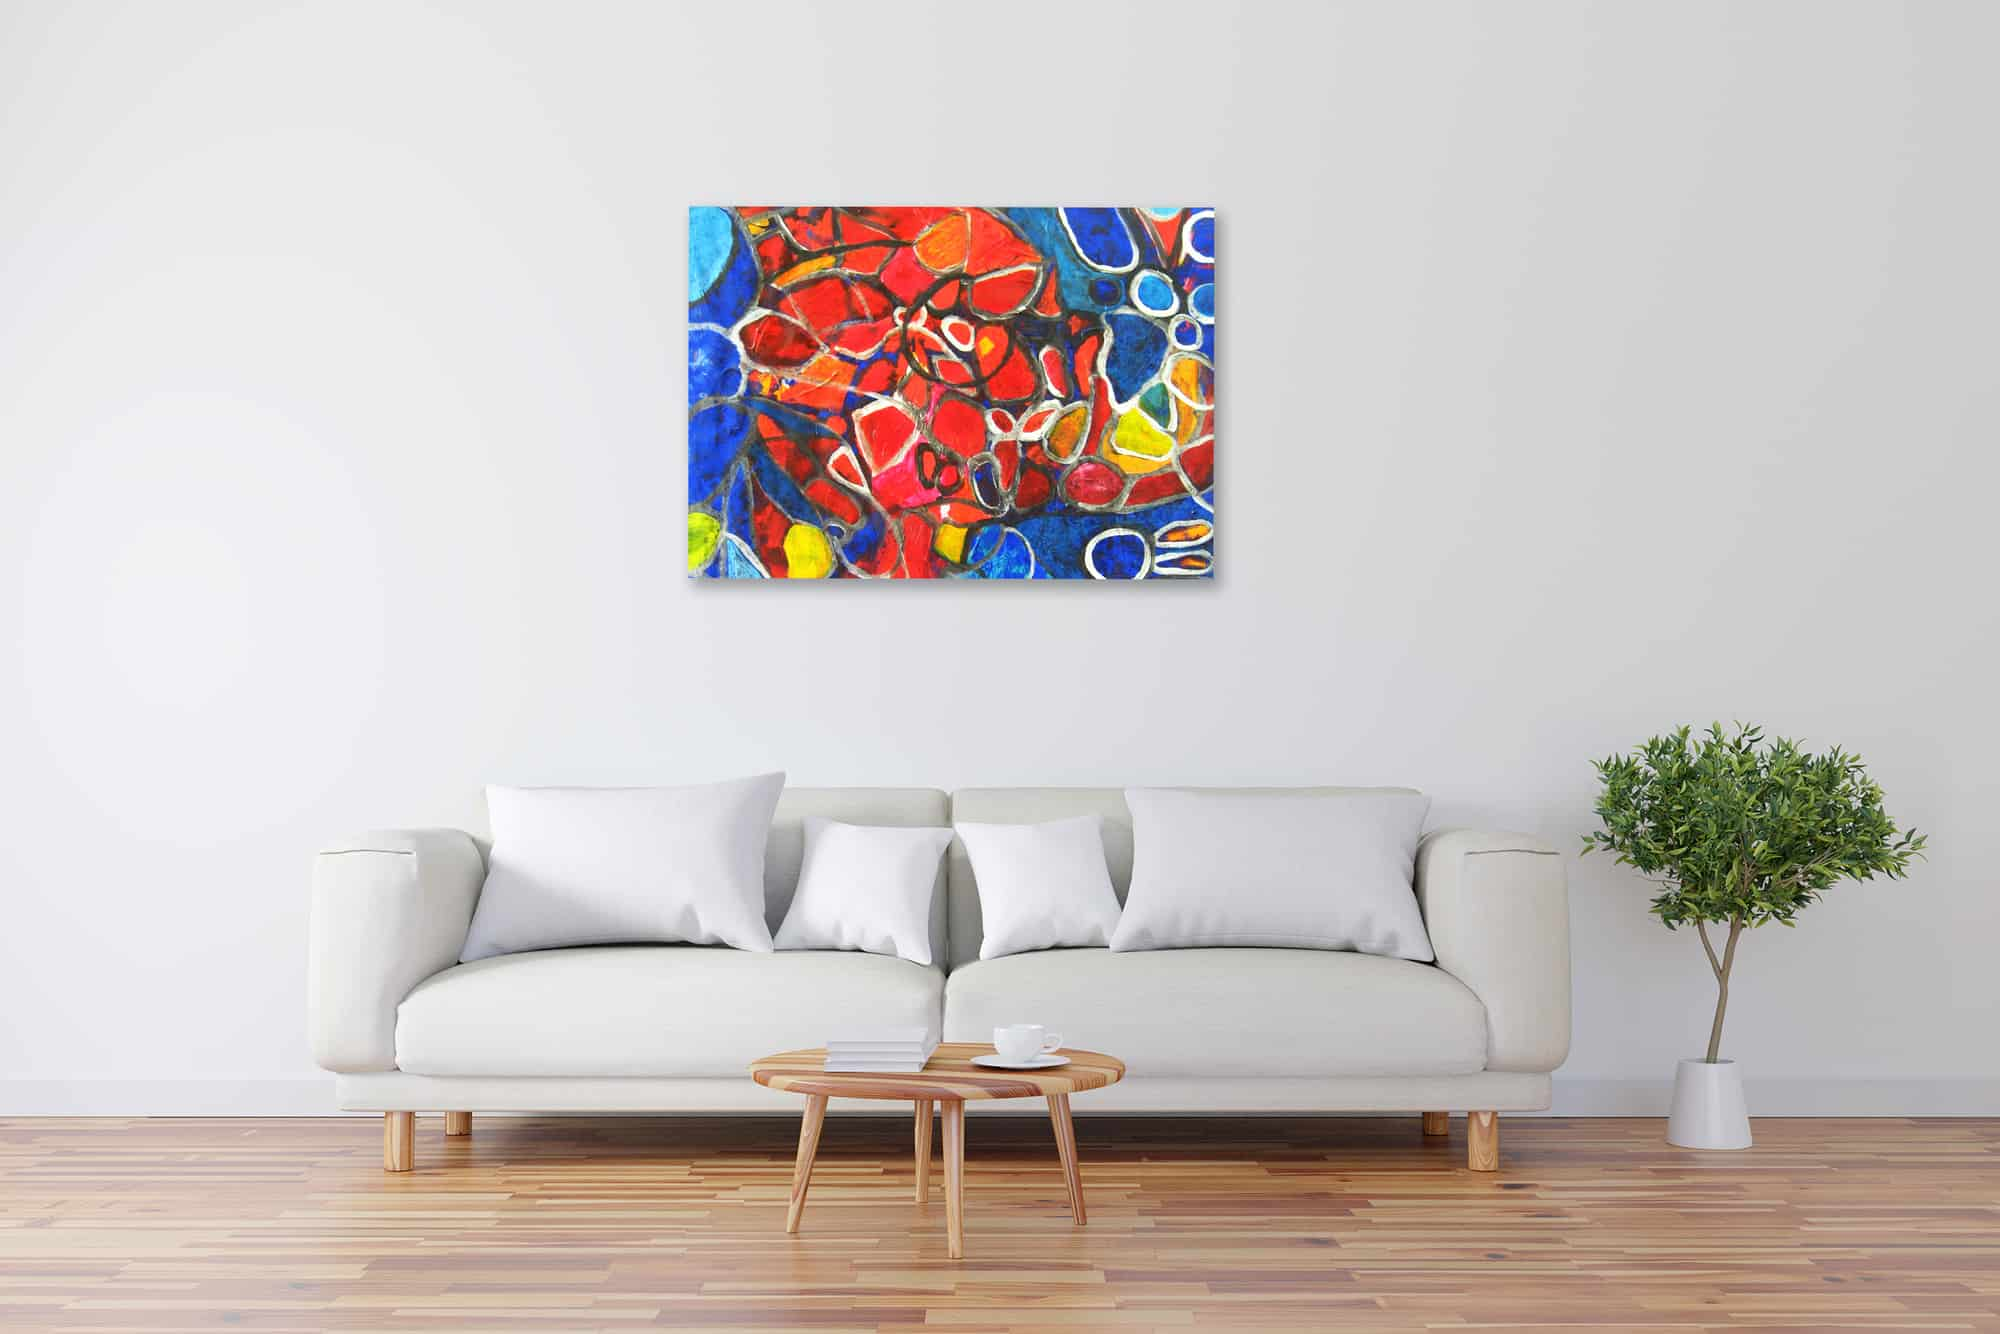 Acryl Gemälde abstraktes Mosaik bild kaufen